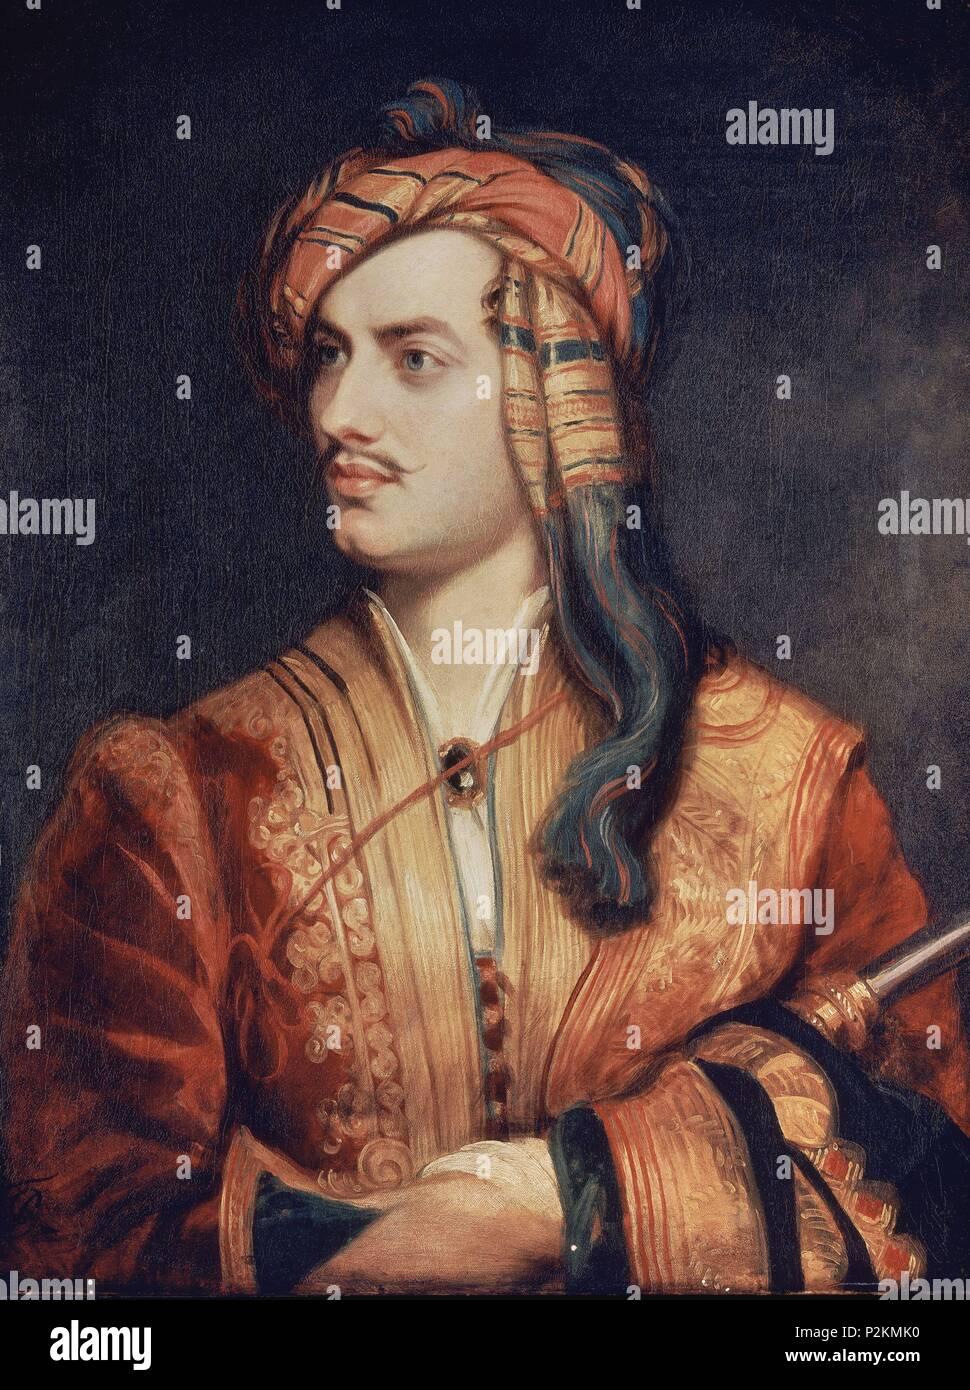 Portrait Poet Lord Byron Greek Costume Royal Historic Large Canvas Print